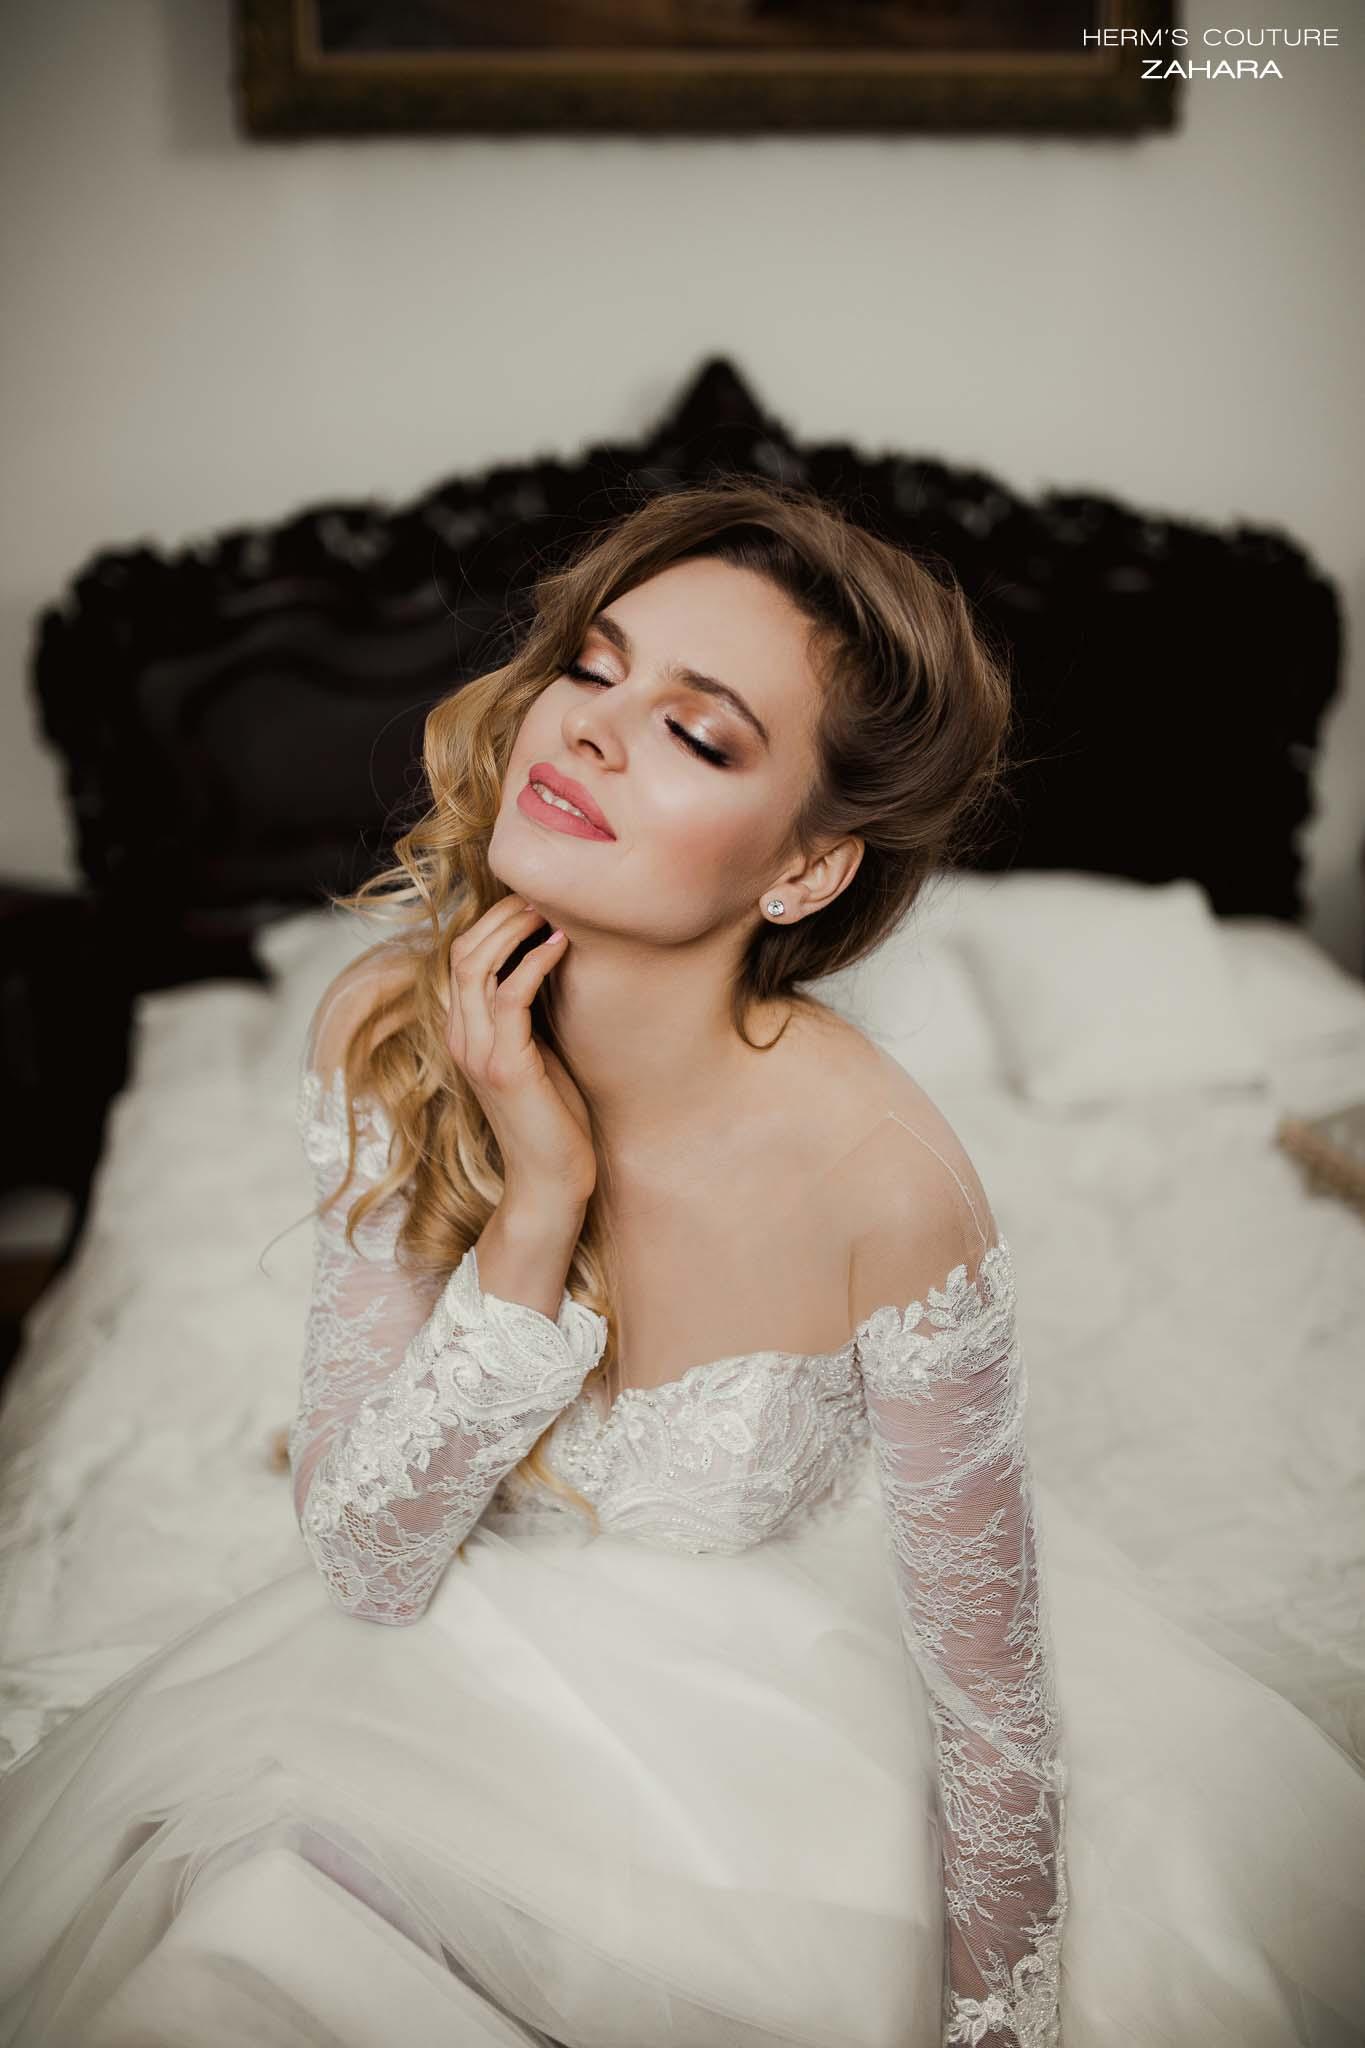 wedding dress Herm's Couture Zahara